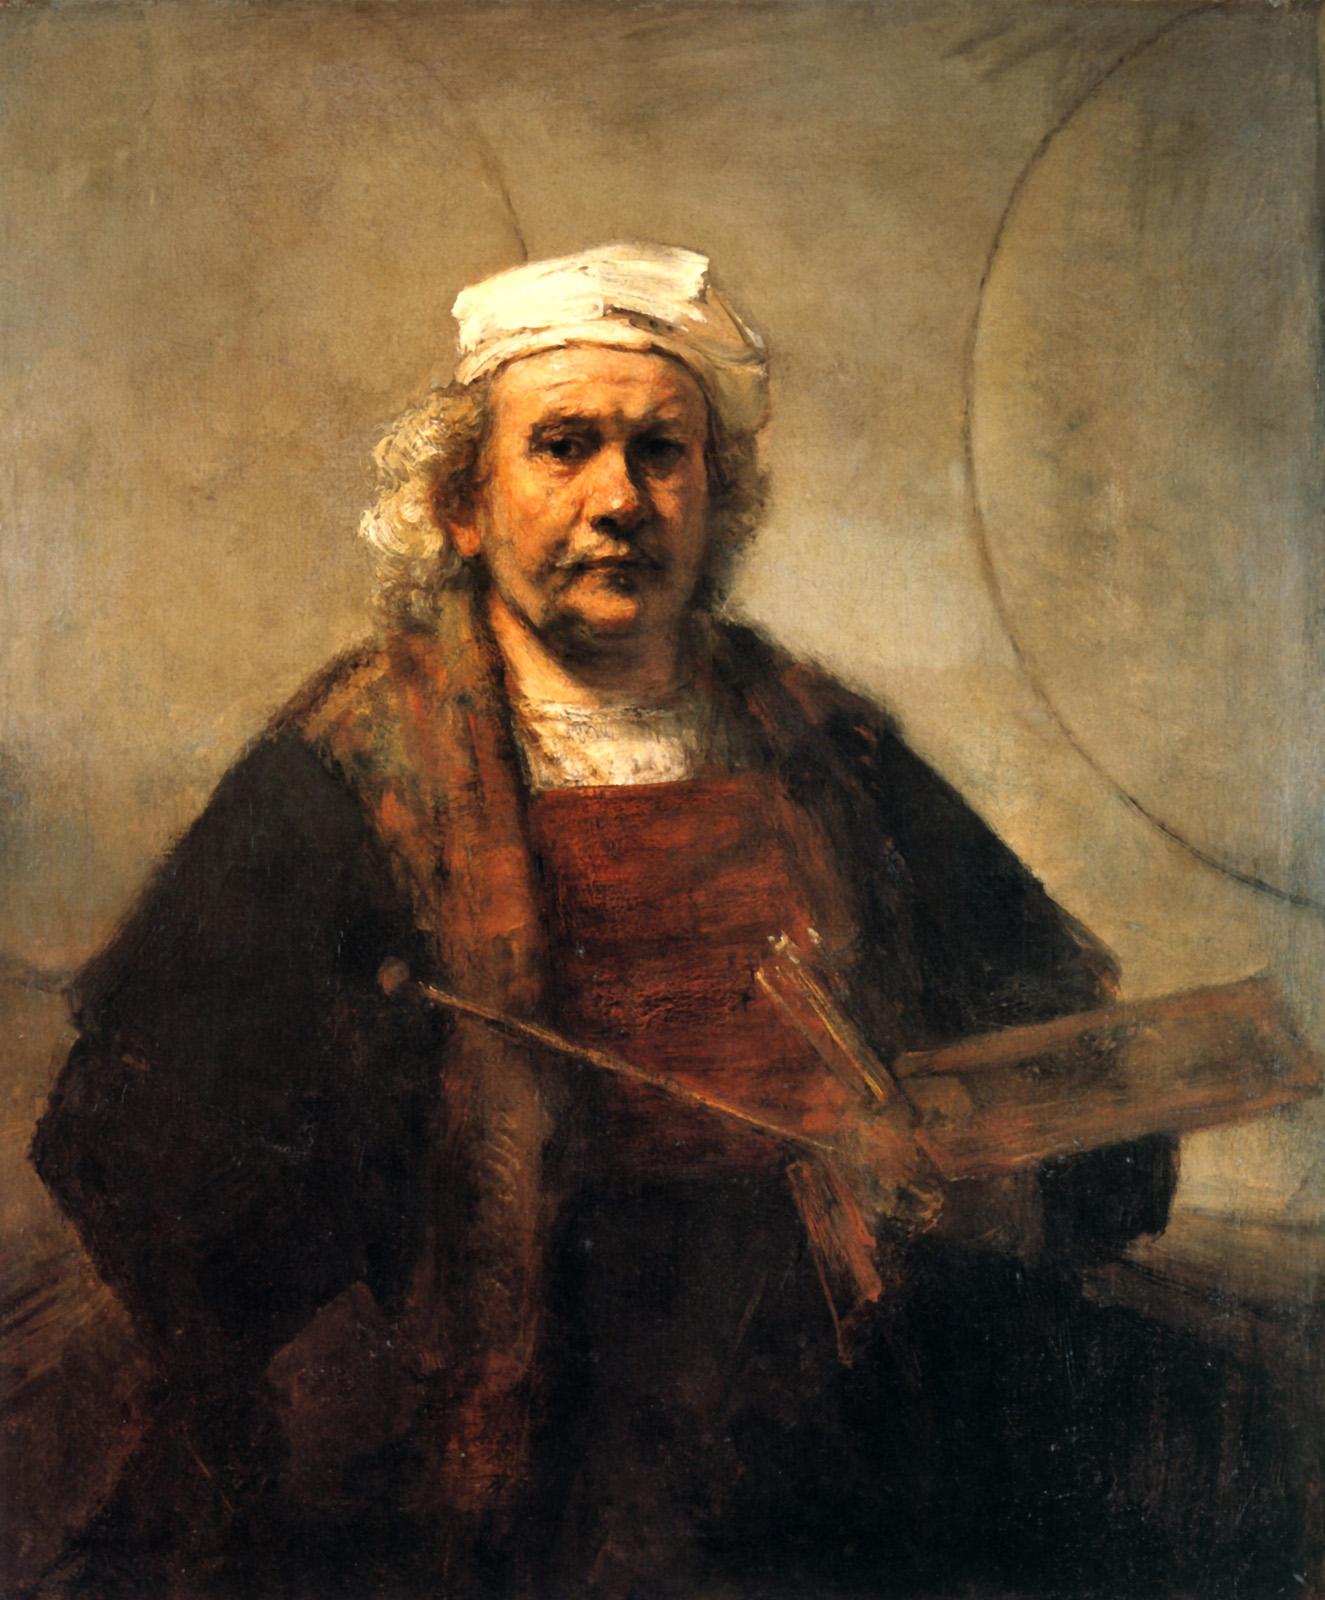 Rembrandt Harmenszoon van Rijn, Self Portrait, Oil on Canvas, 1663